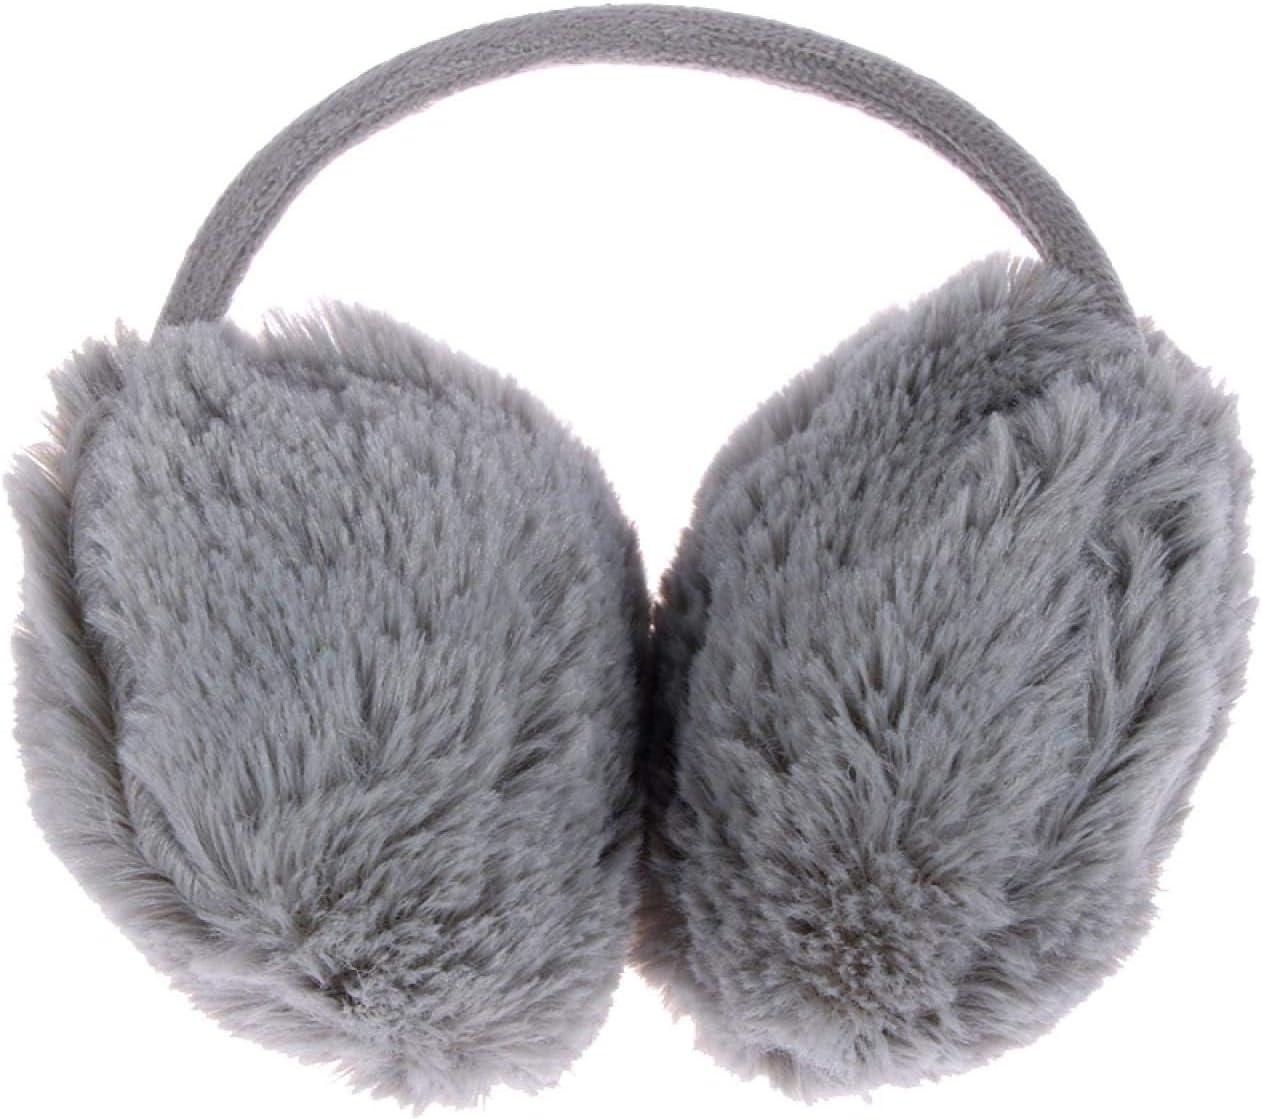 AMILIEe Earmuffs Fashion Adult Girl Earmu Korean Winter 2021 Max 70% OFF